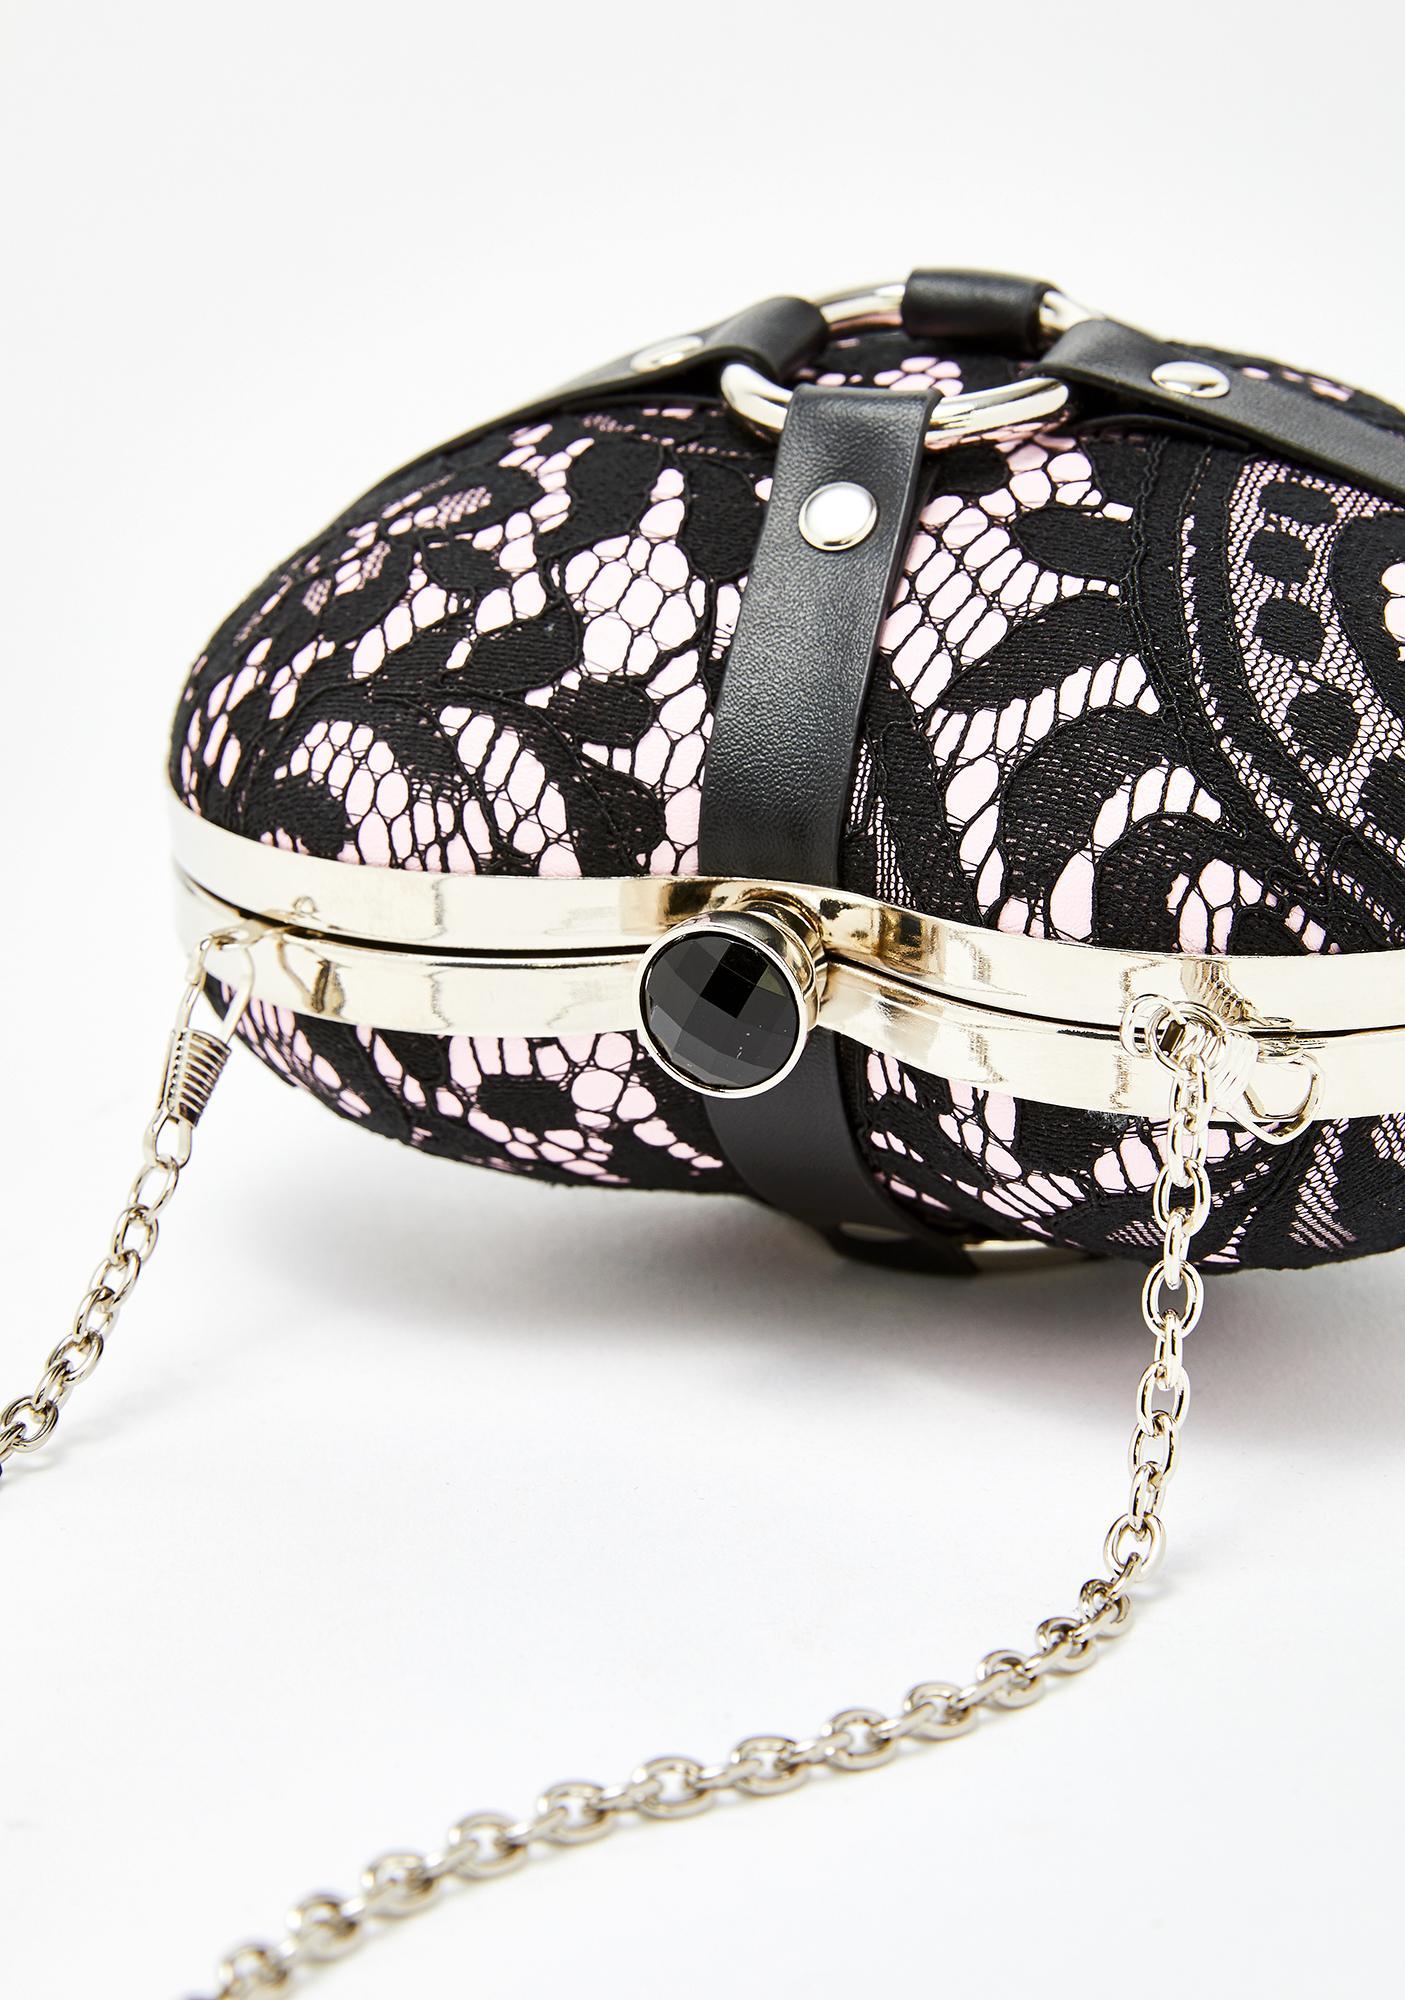 Sugar Thrillz Sweet Kink Bondage Bag